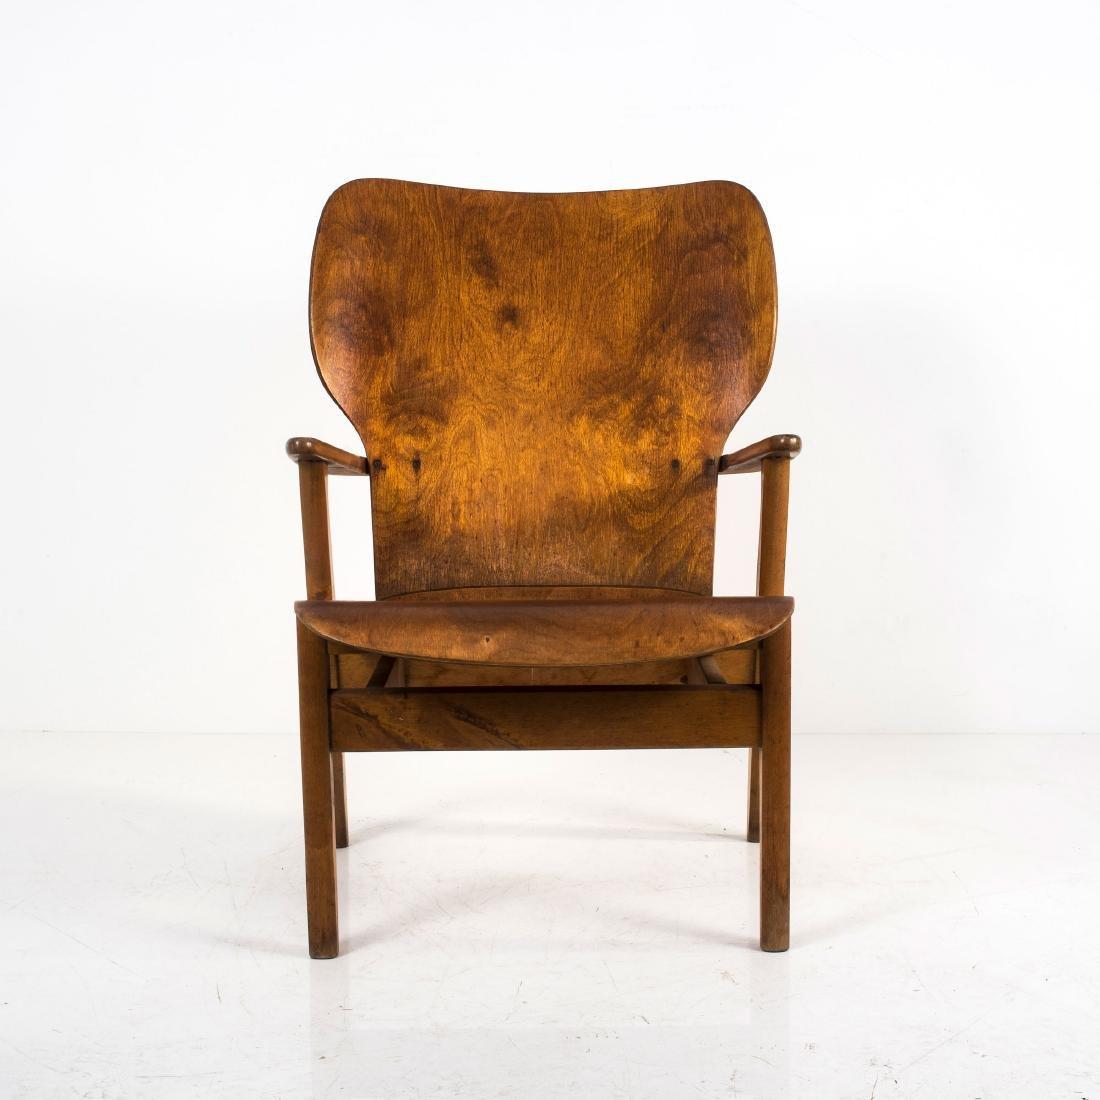 Armchair 'Domus Lux', c1948 - 3